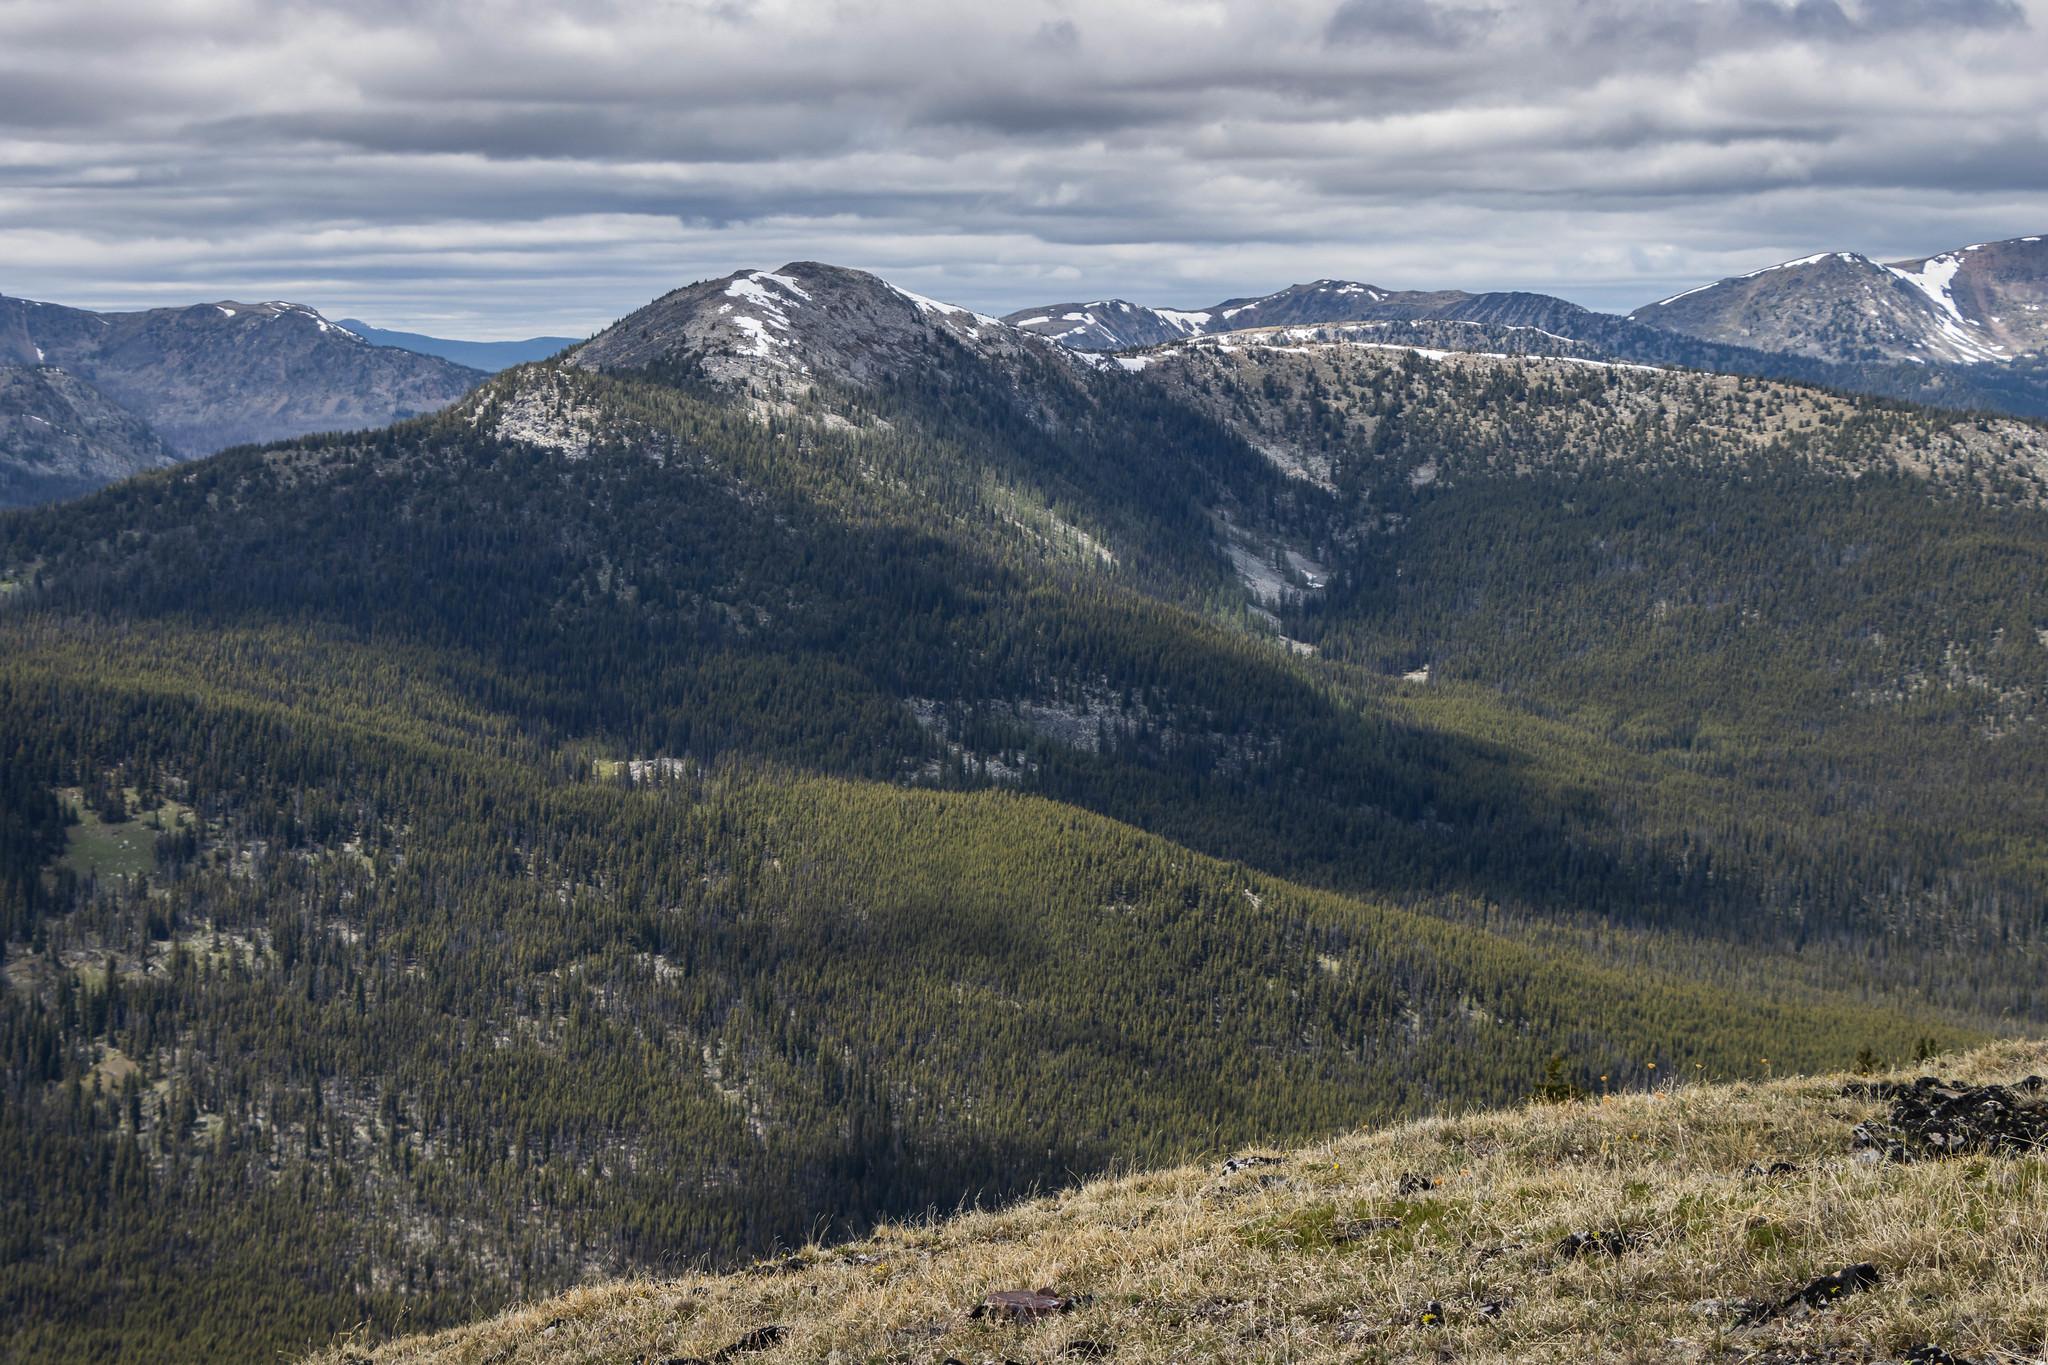 Final stop, Snowshoe Mountain